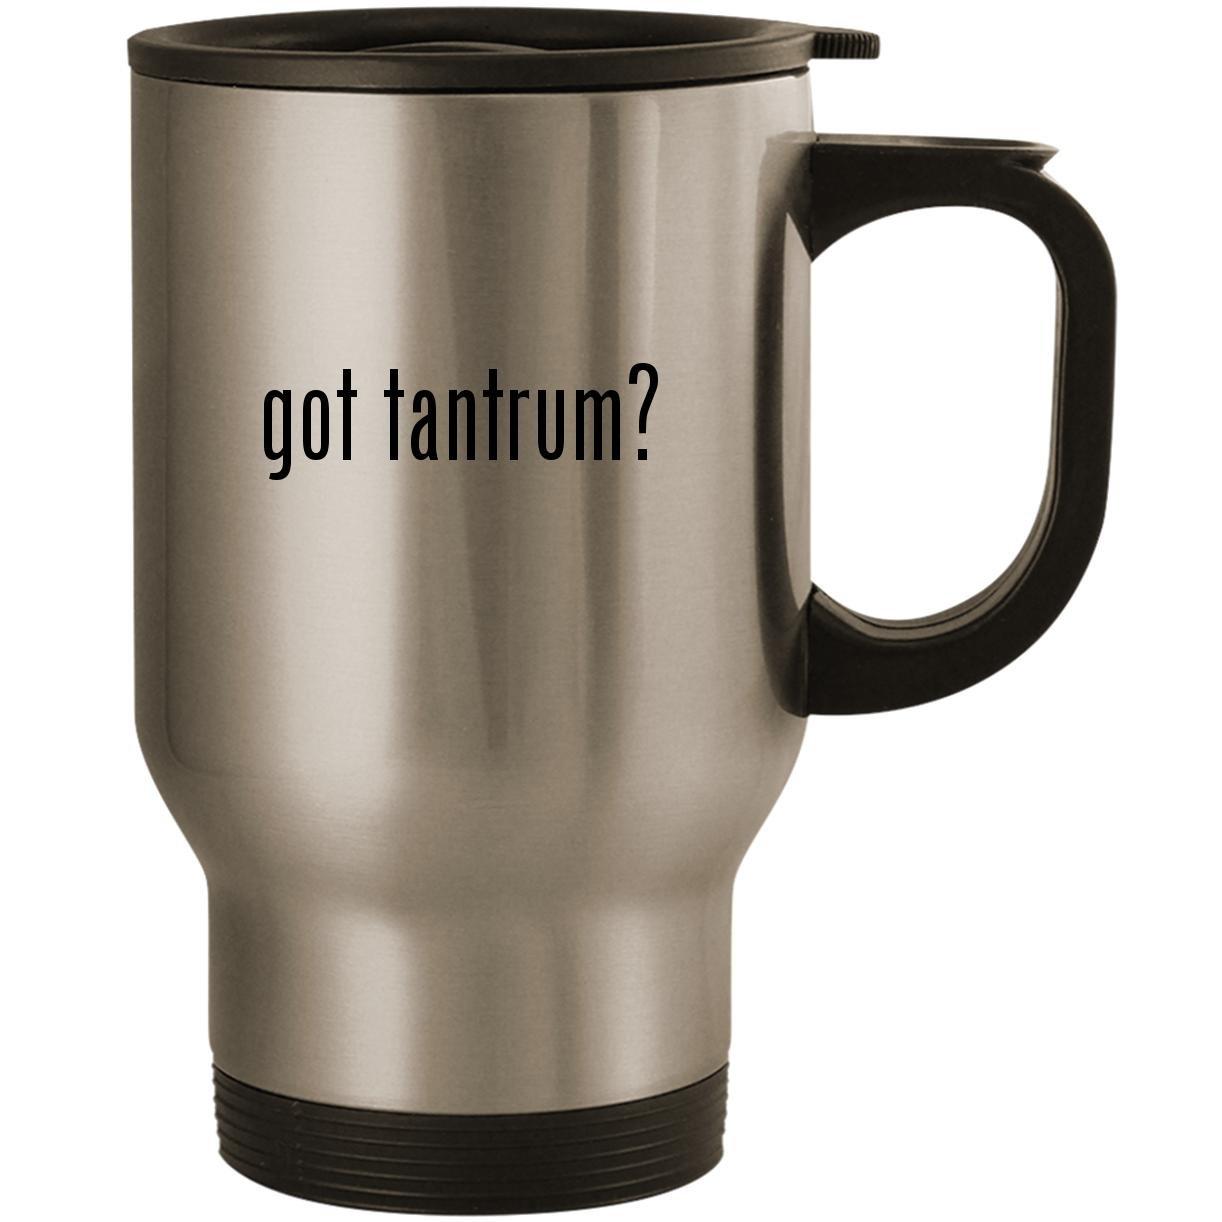 Got Tantrum  – ステンレススチール14オンスRoad Ready旅行マグ シルバー  シルバー B07FQTV3YH